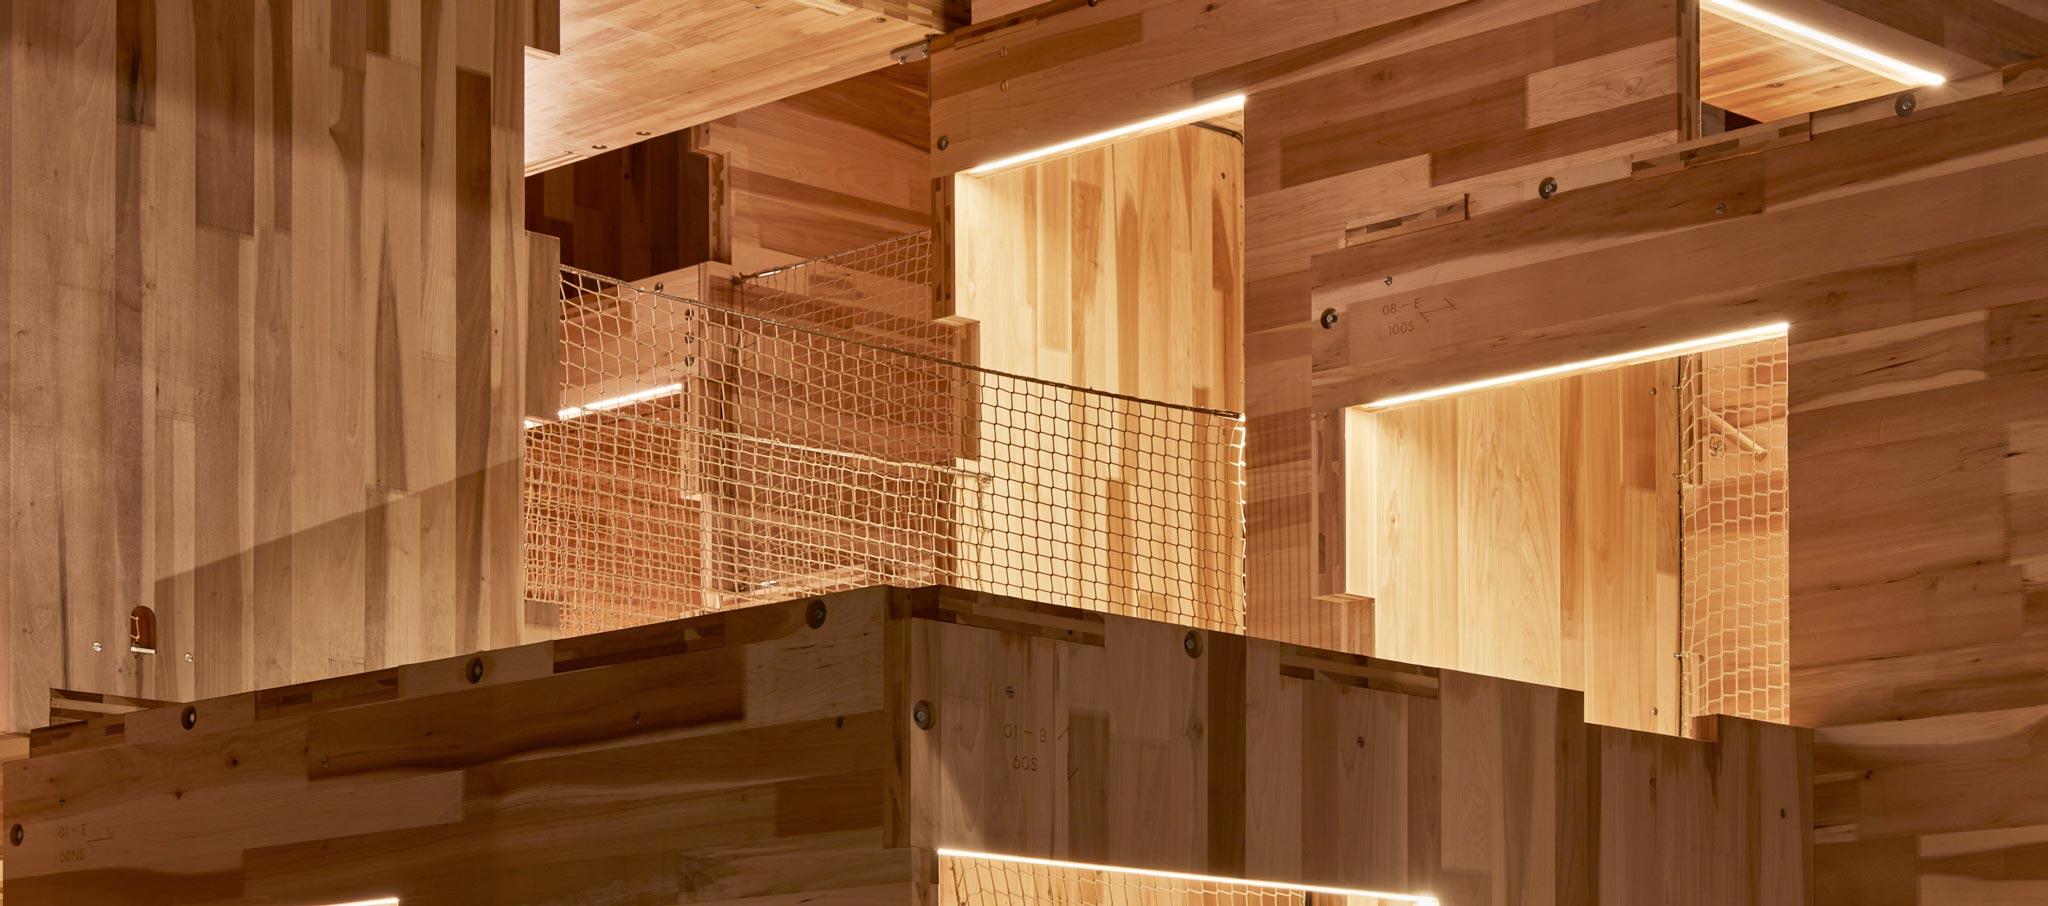 MultiPly por Waugh Thistleton Architects. Fotografía por Ed Reeve